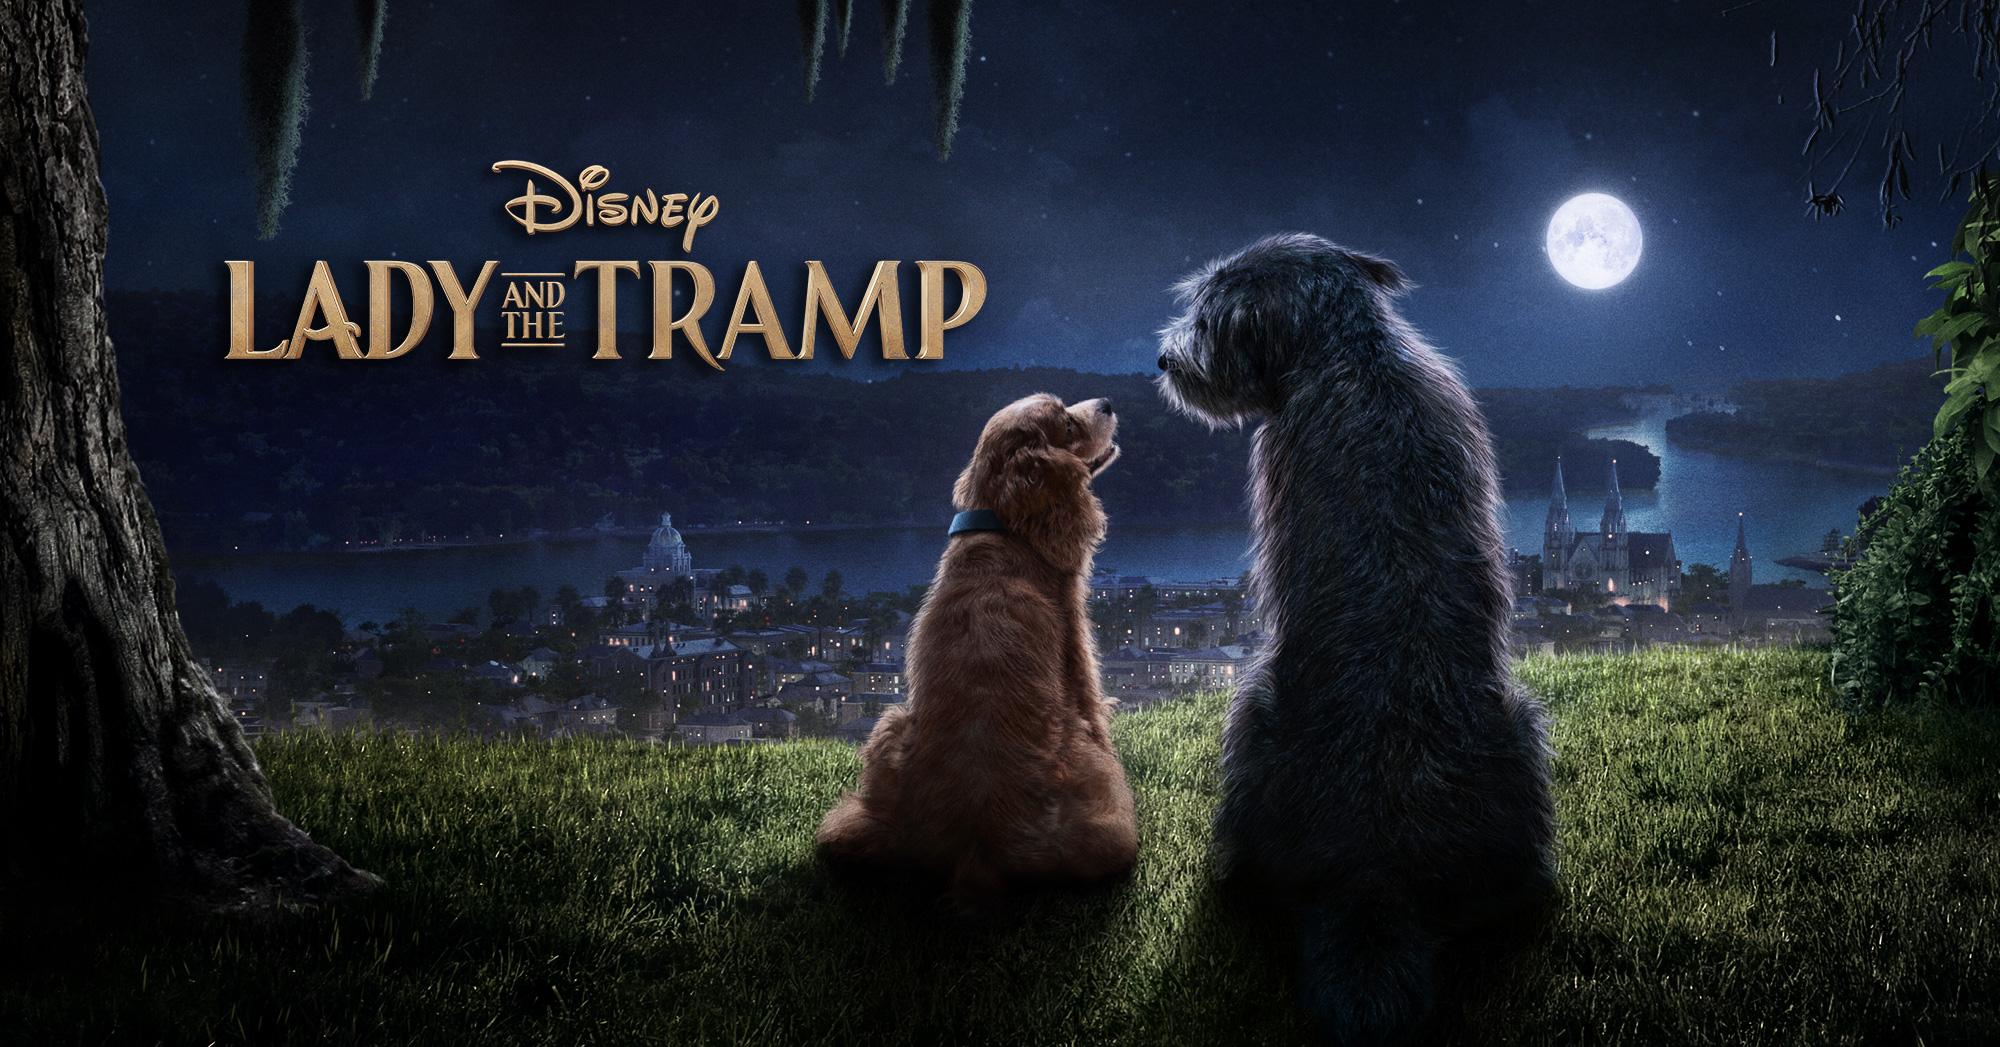 Lady and the Tramp | Disney+ Horz. Art Design, Finishing & Illustration